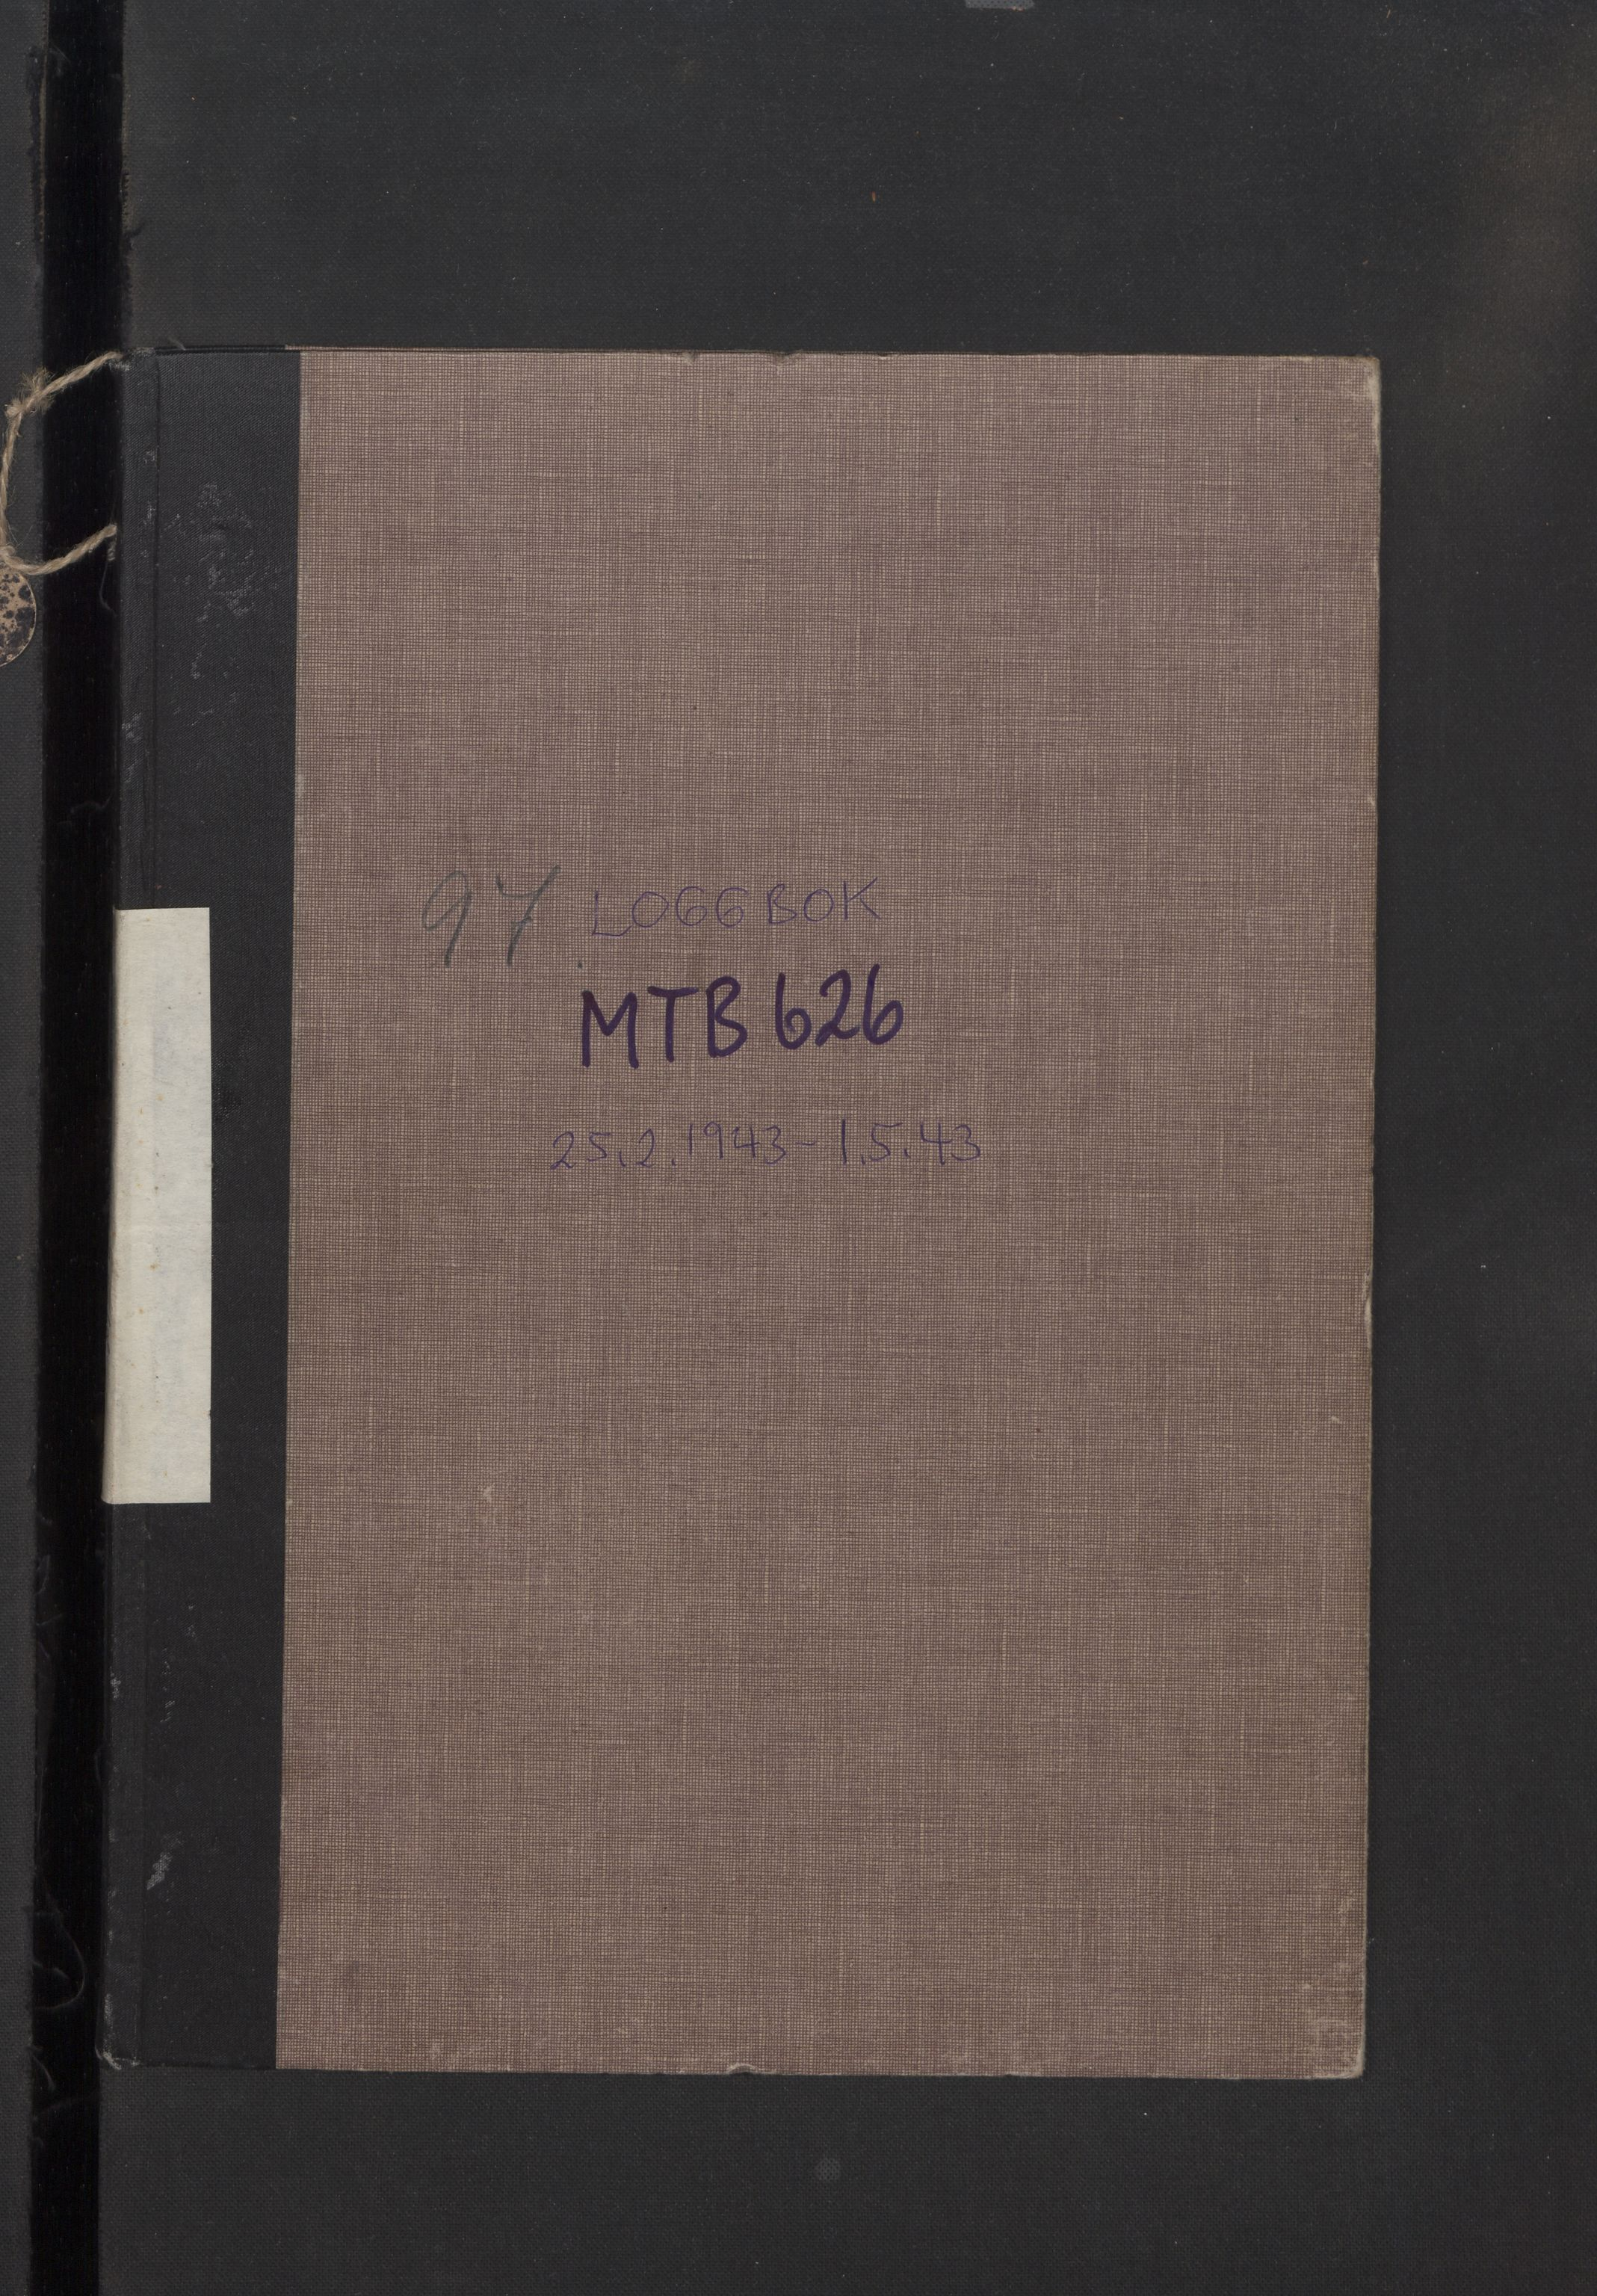 RA, Forsvaret, Sjøforsvarets fartøyer, Gm6/L0003: Loggbok, 1943